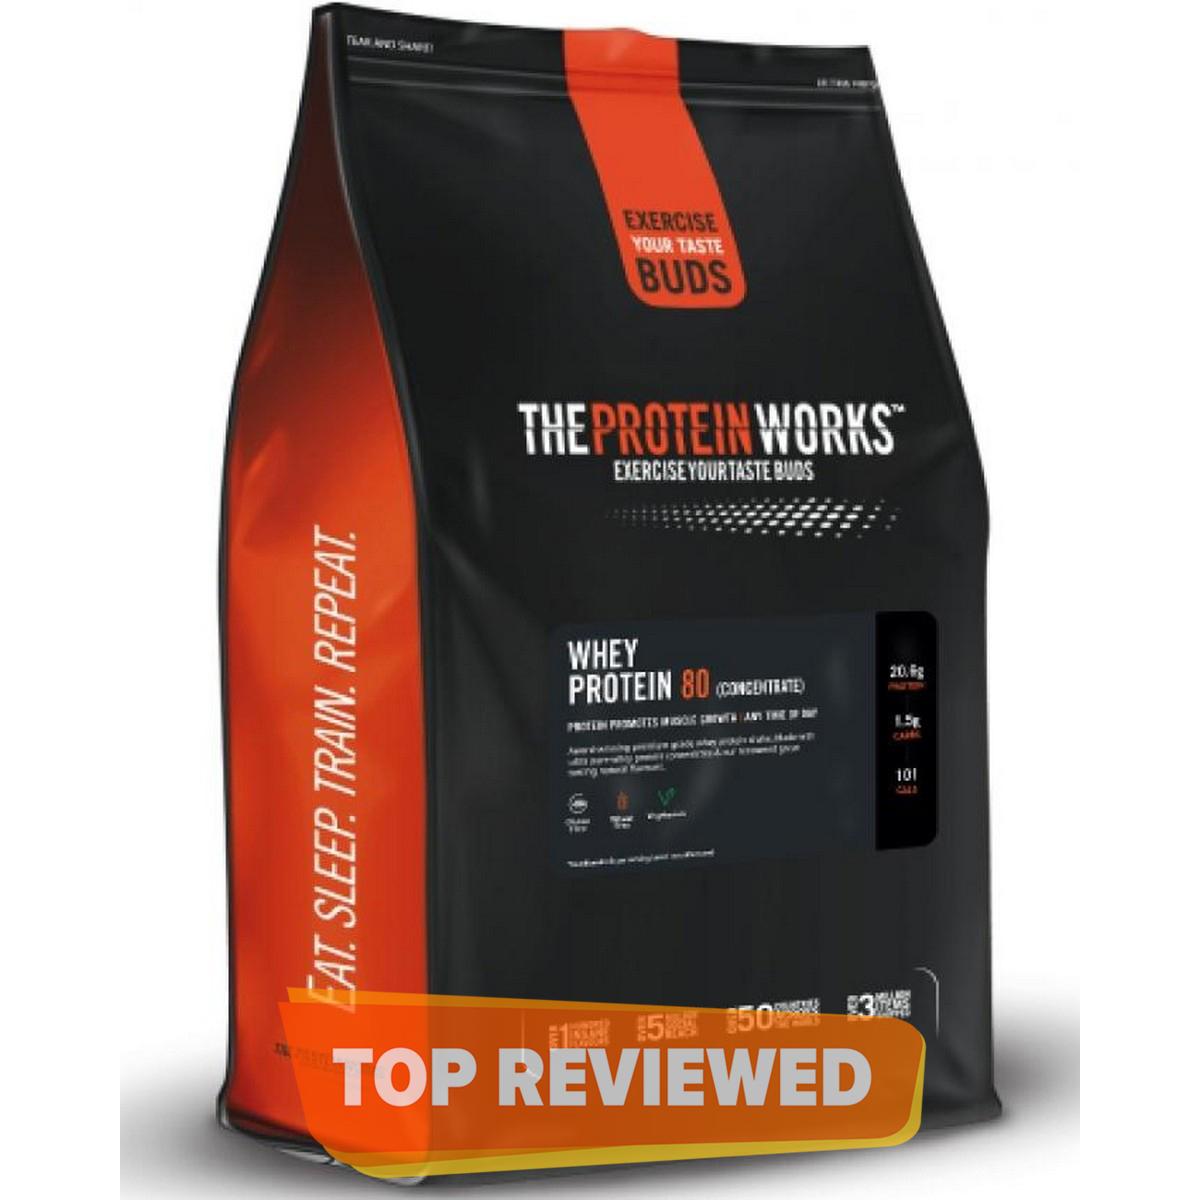 Whey Protein 80 - 500 g (1.1 lbs) - Vanilla Creme